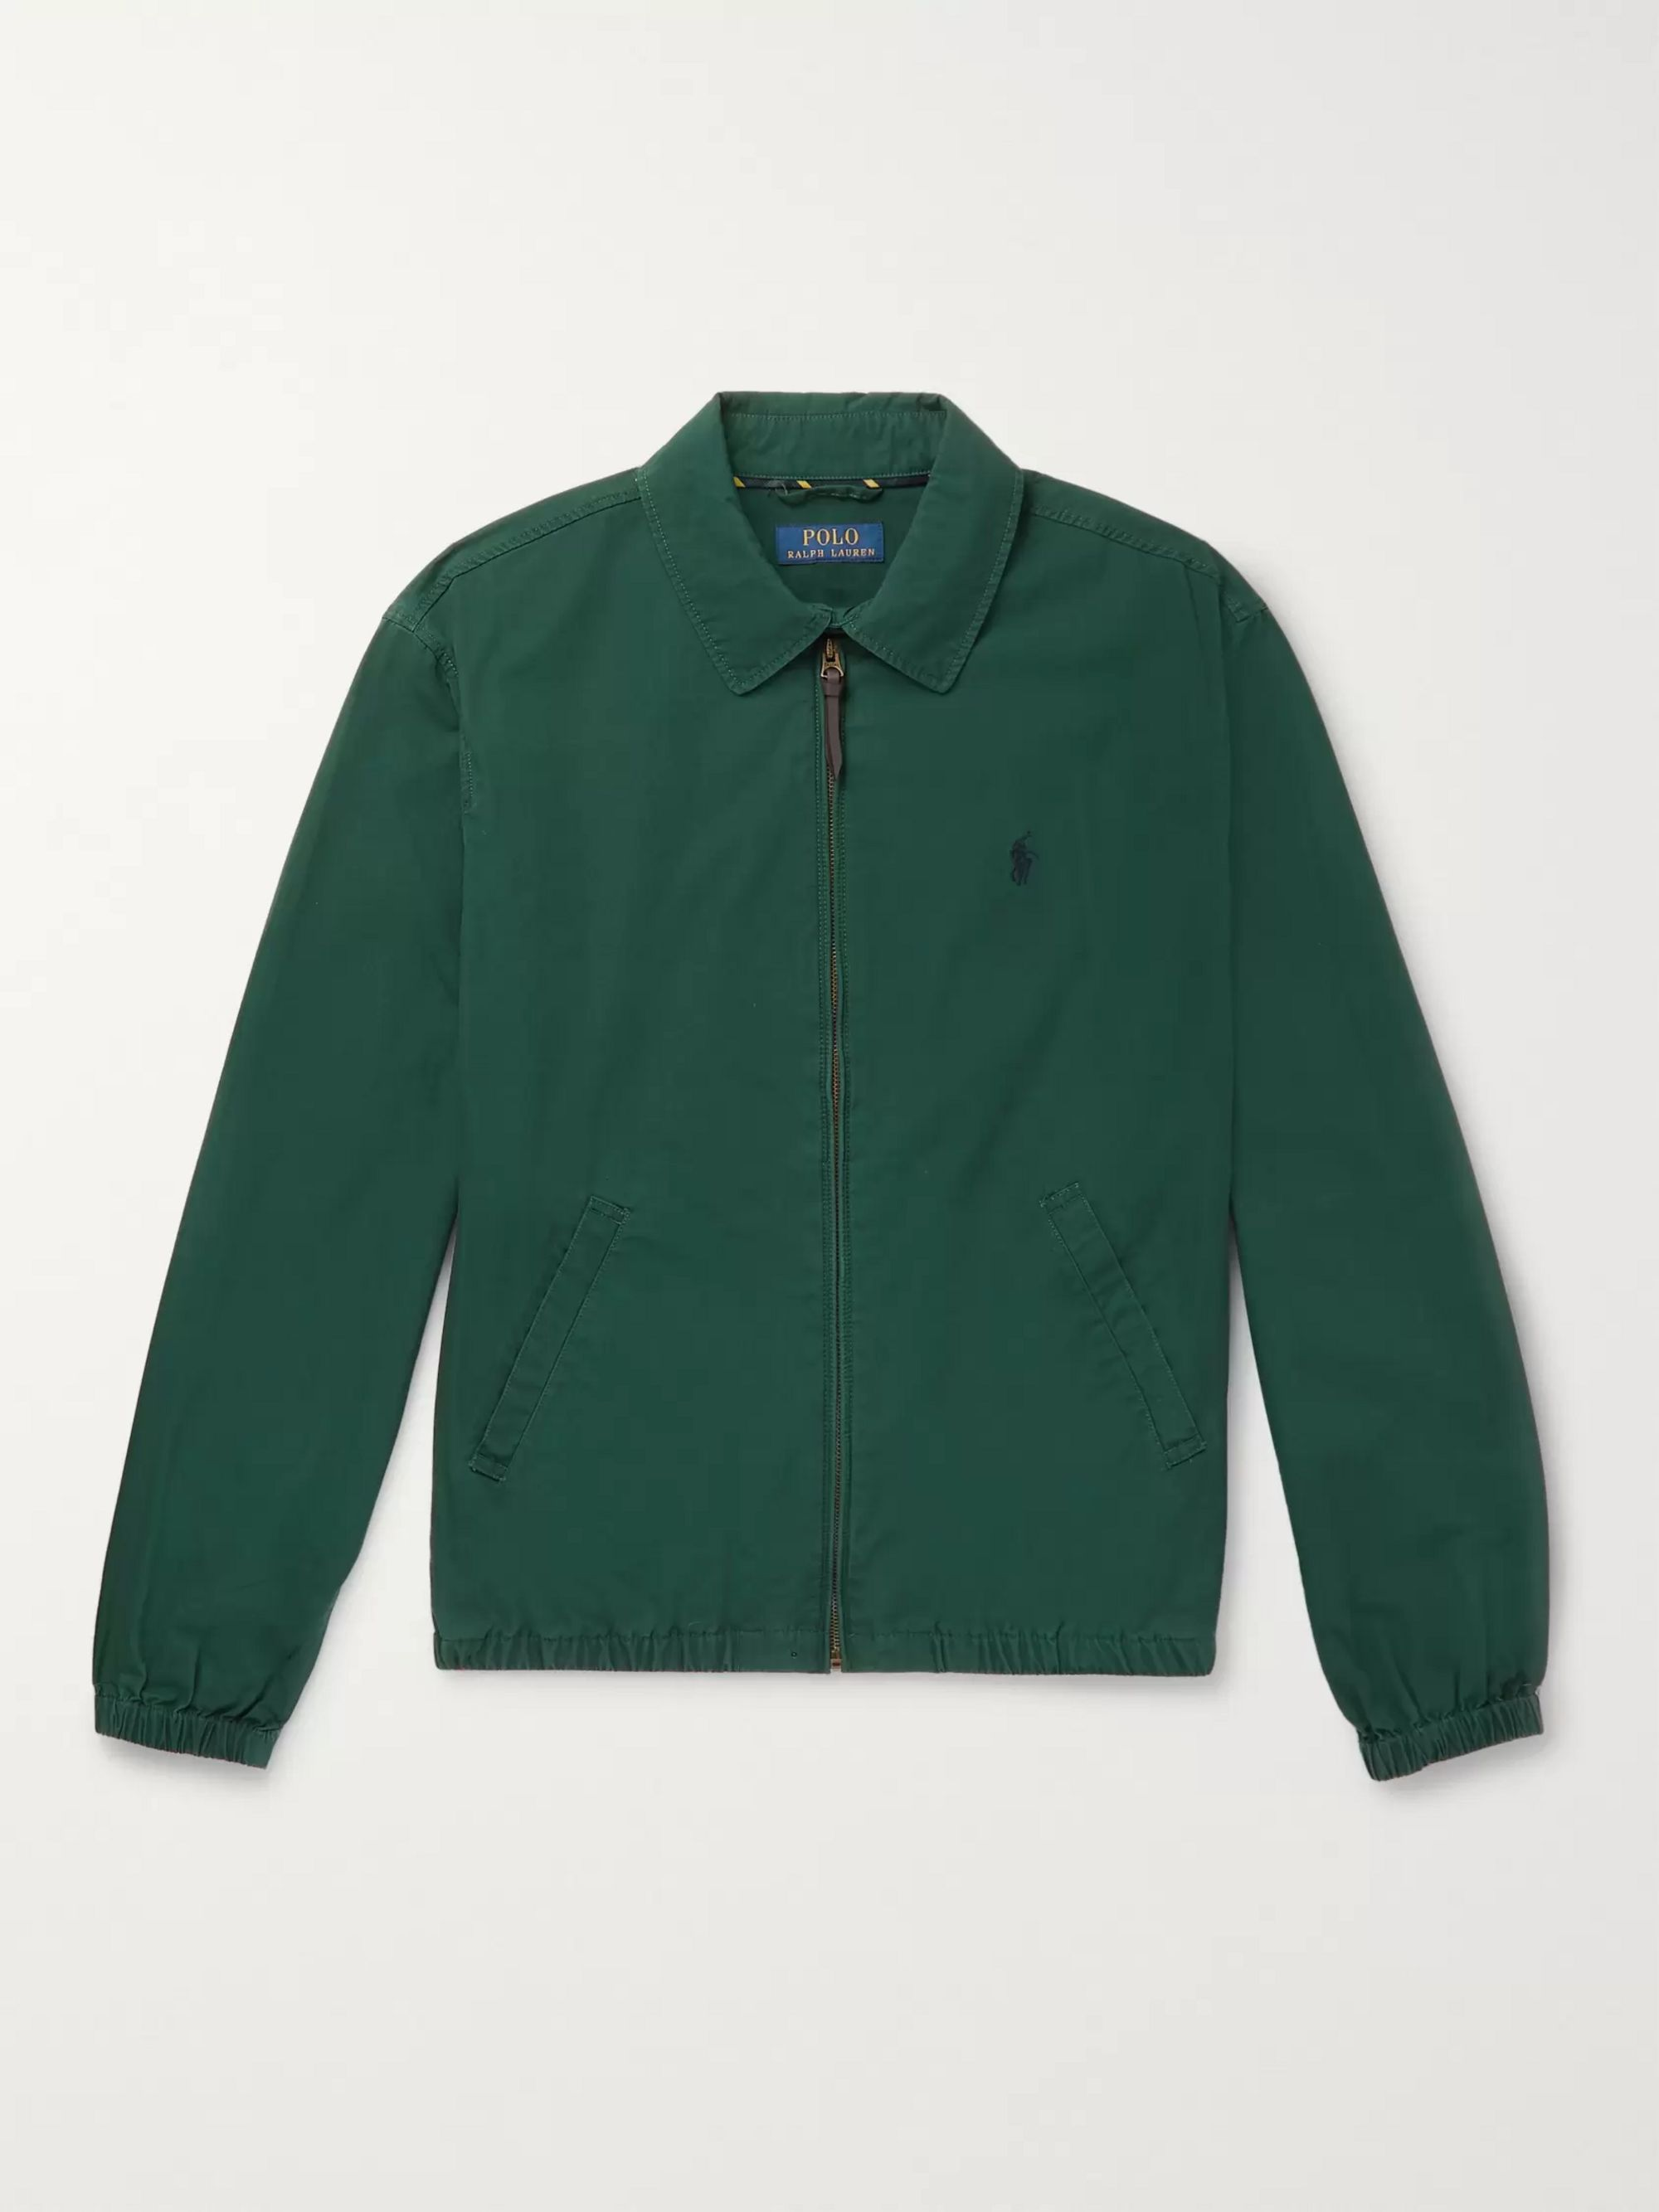 Green Cotton Harrington Jacket | Polo Ralph